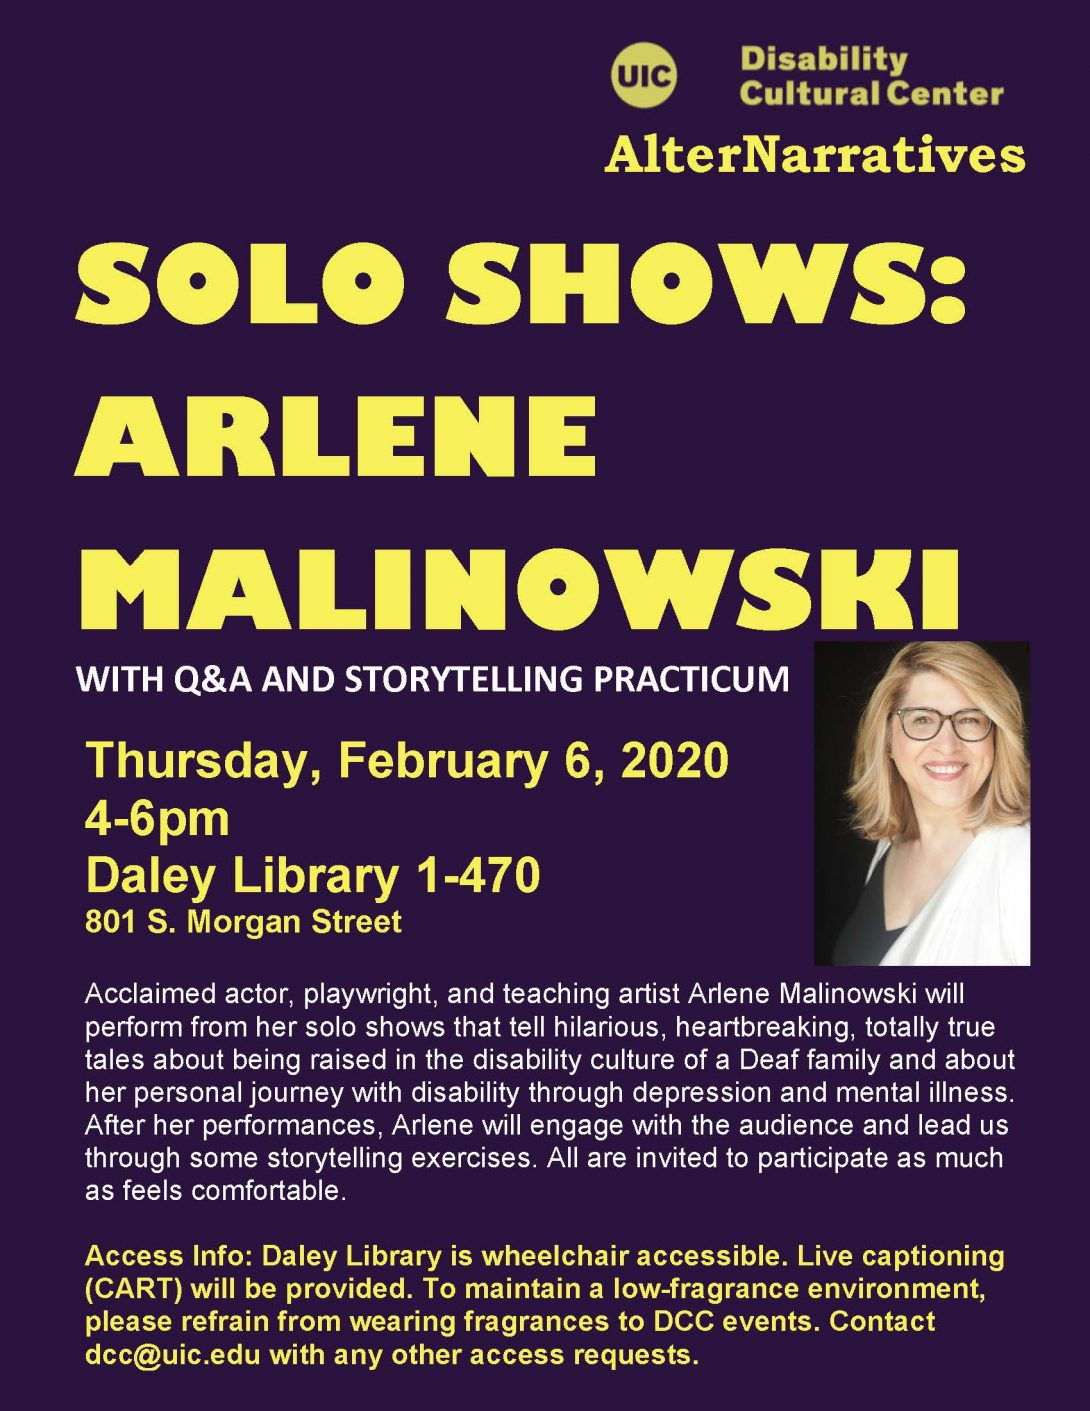 Solo Shows: Arlene Malinowski flyer